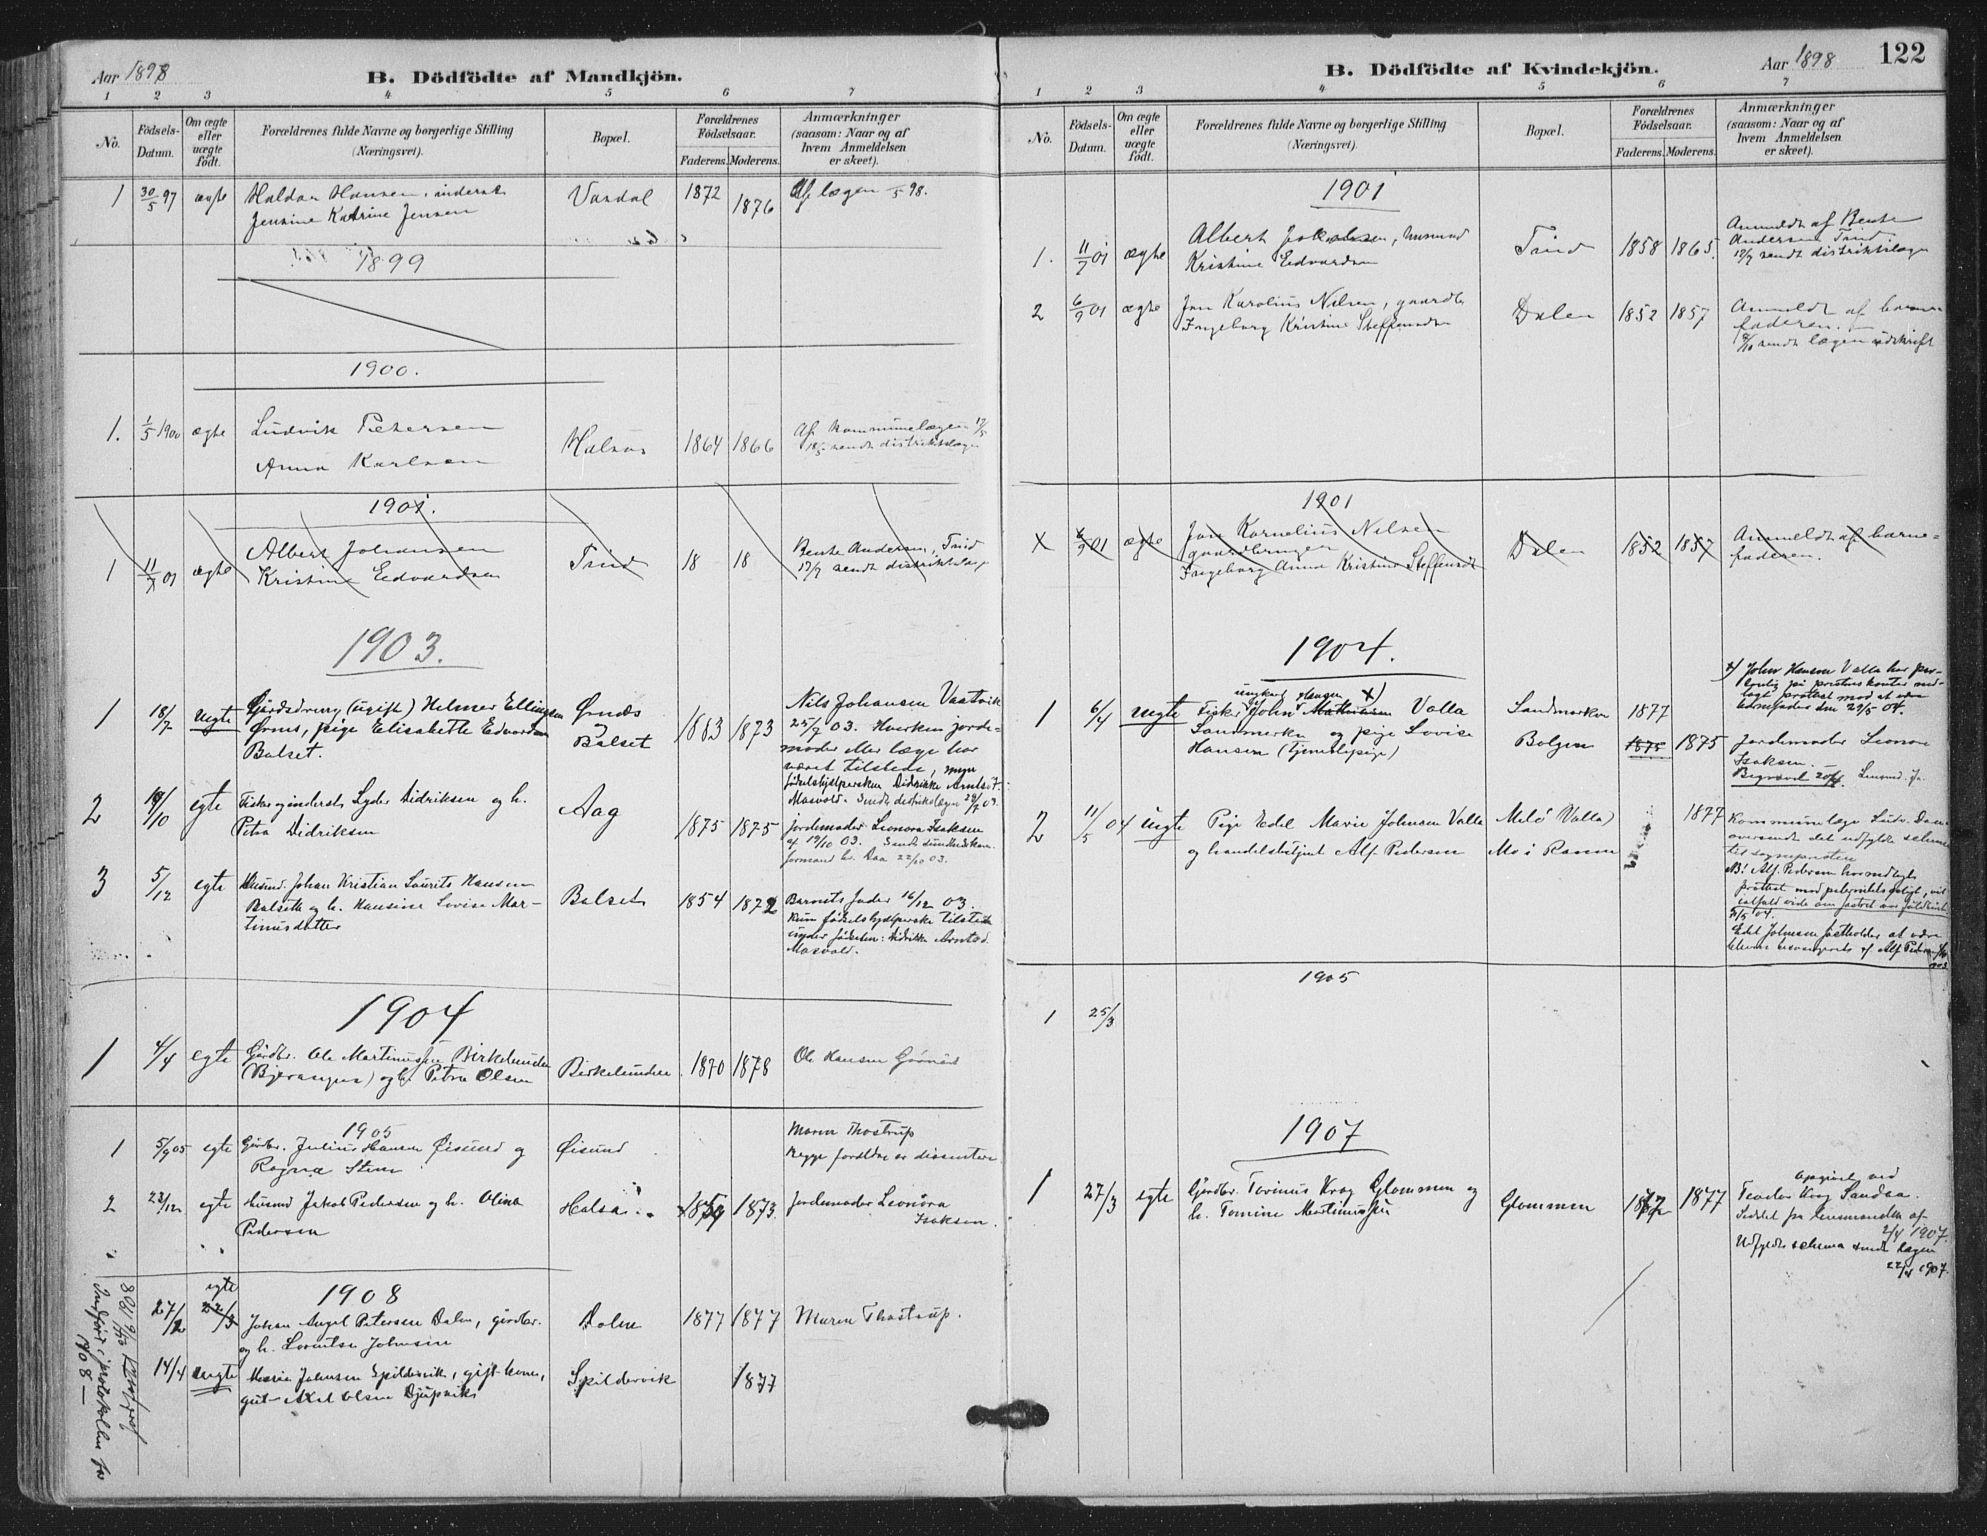 SAT, Ministerialprotokoller, klokkerbøker og fødselsregistre - Nordland, 843/L0628: Ministerialbok nr. 843A03, 1889-1907, s. 122